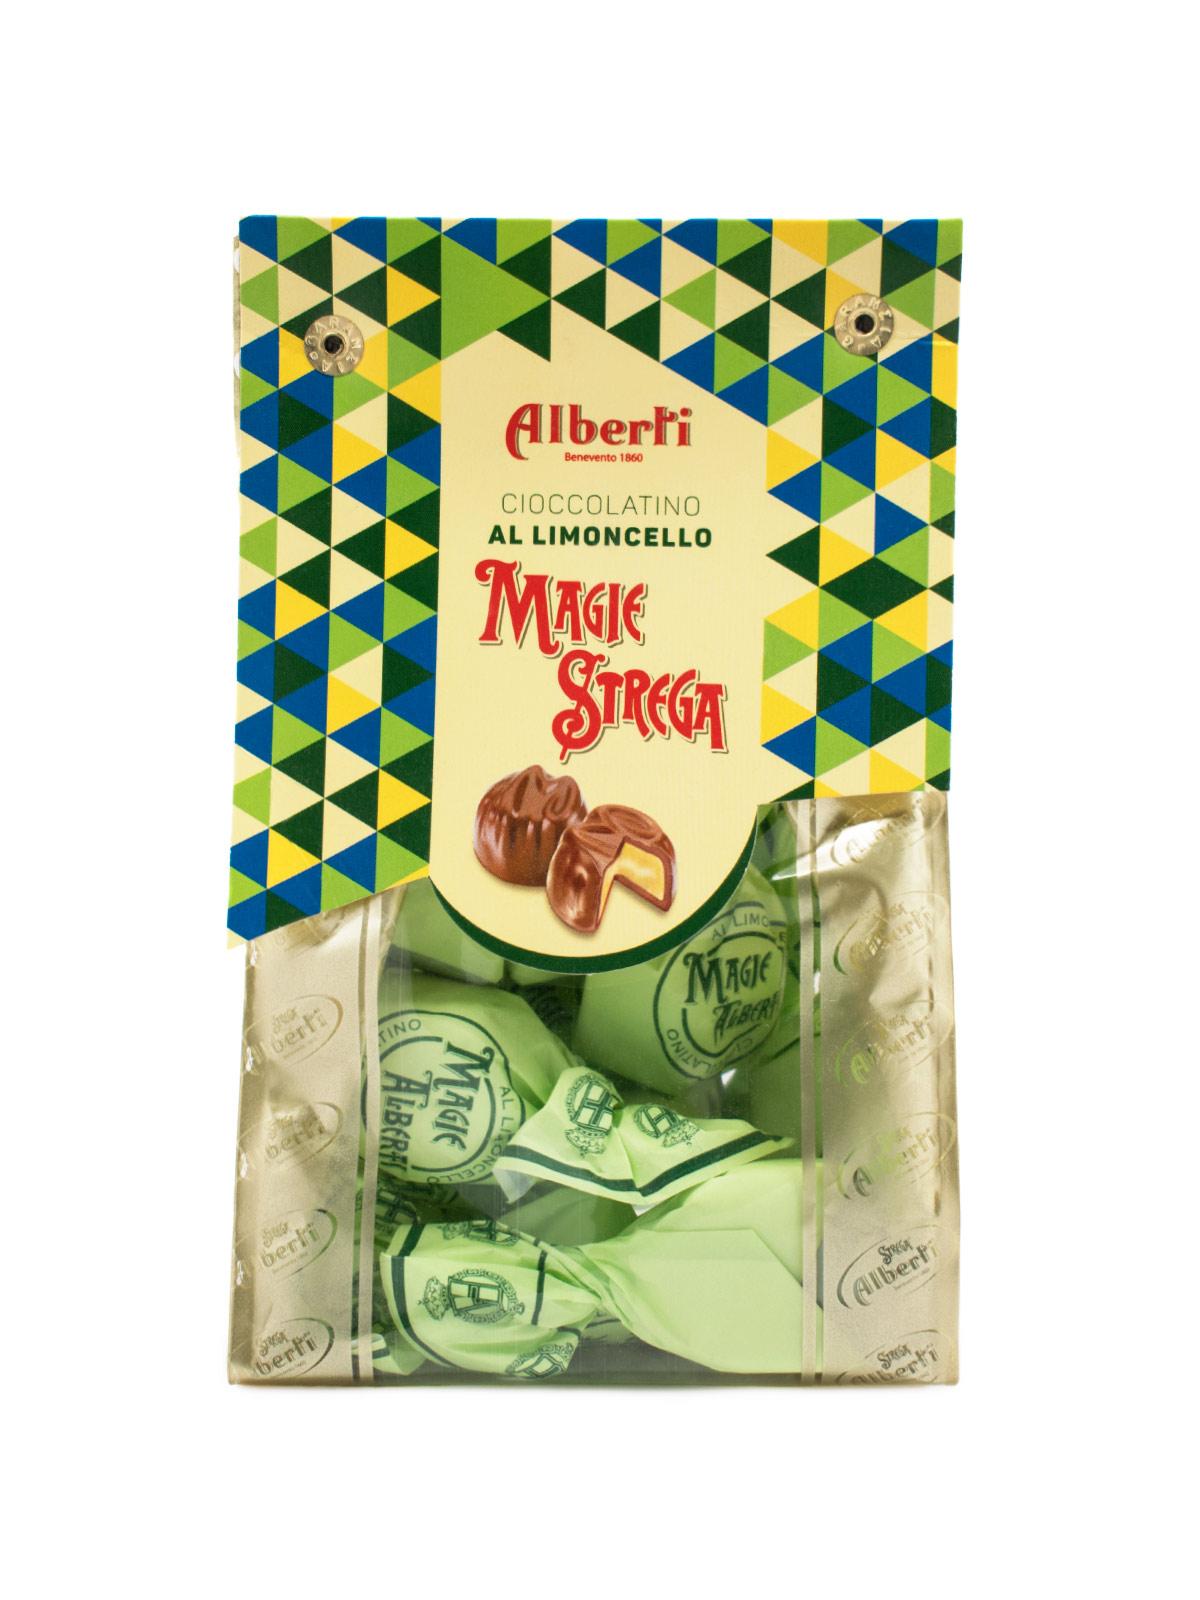 Magie Strega with Limoncello - Sweets, Treats, & Snacks - Buon'Italia